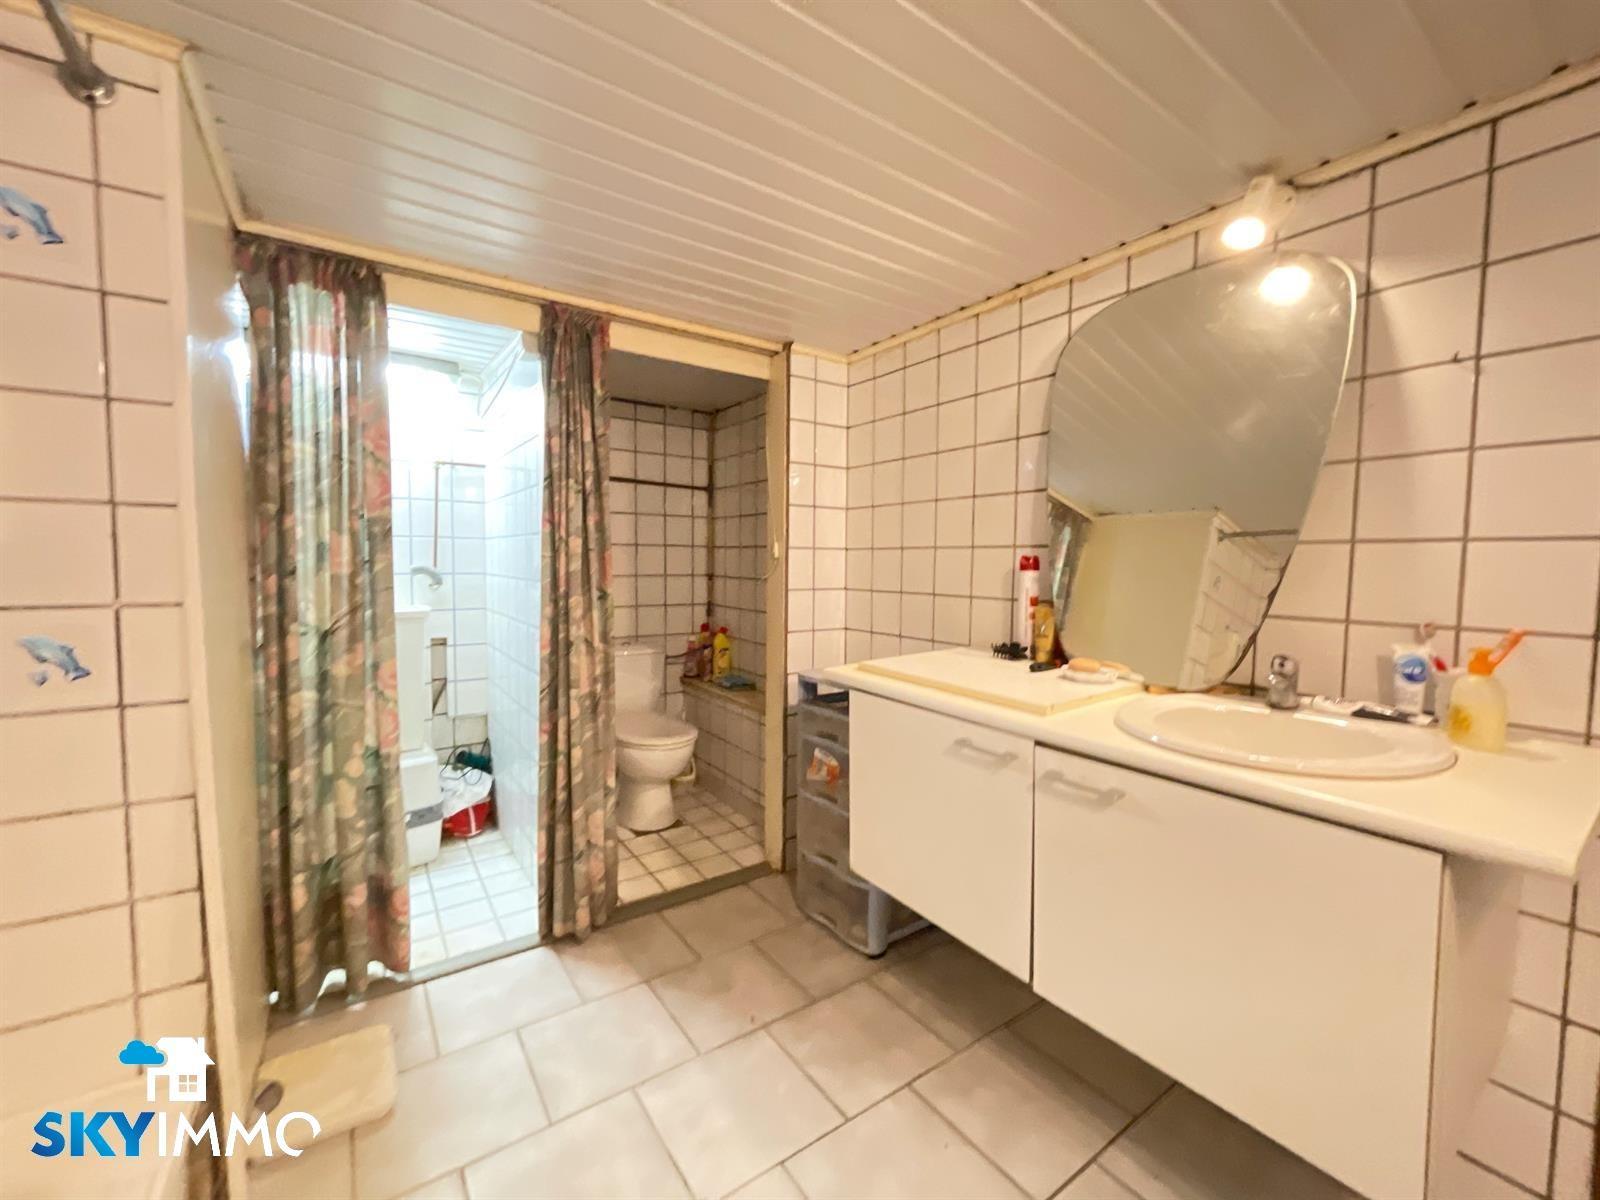 Maison - Herstal - #4448662-18